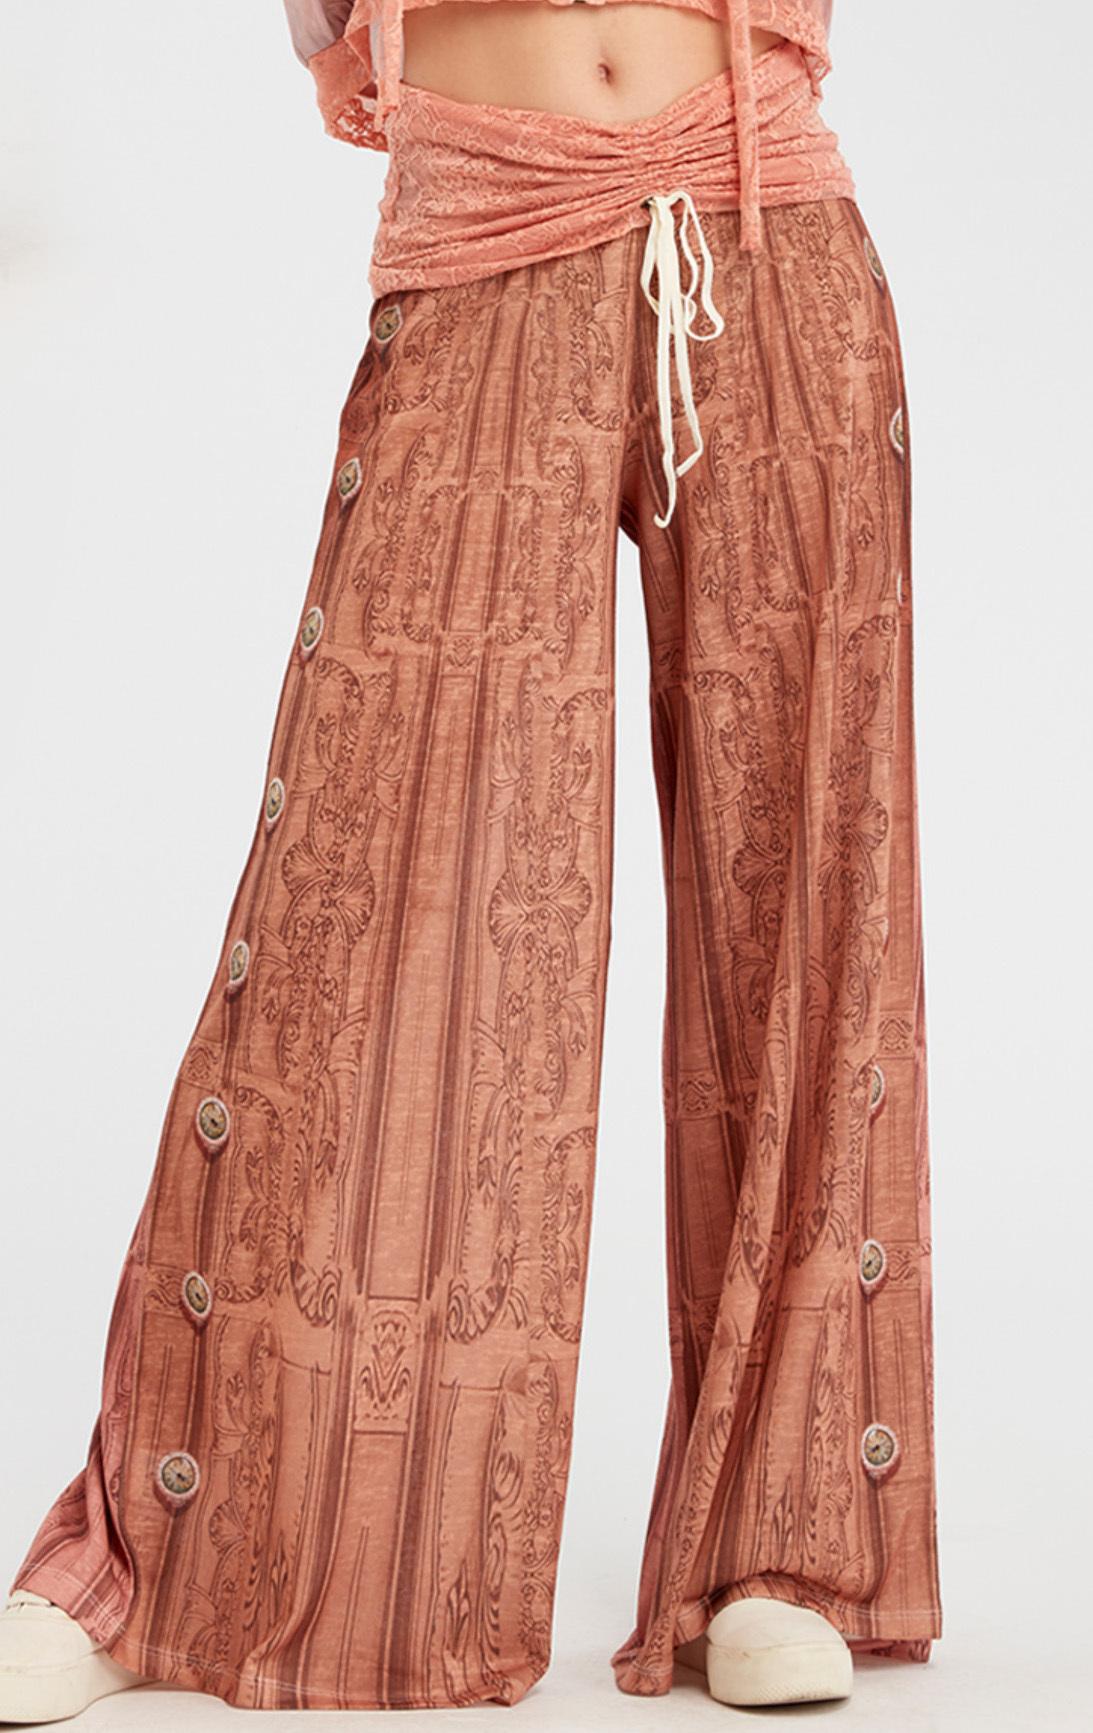 IPNG: Inna Me Royal Rose Clocks Illusion Comfort Drape Pants IPNG_TIMYPD-063